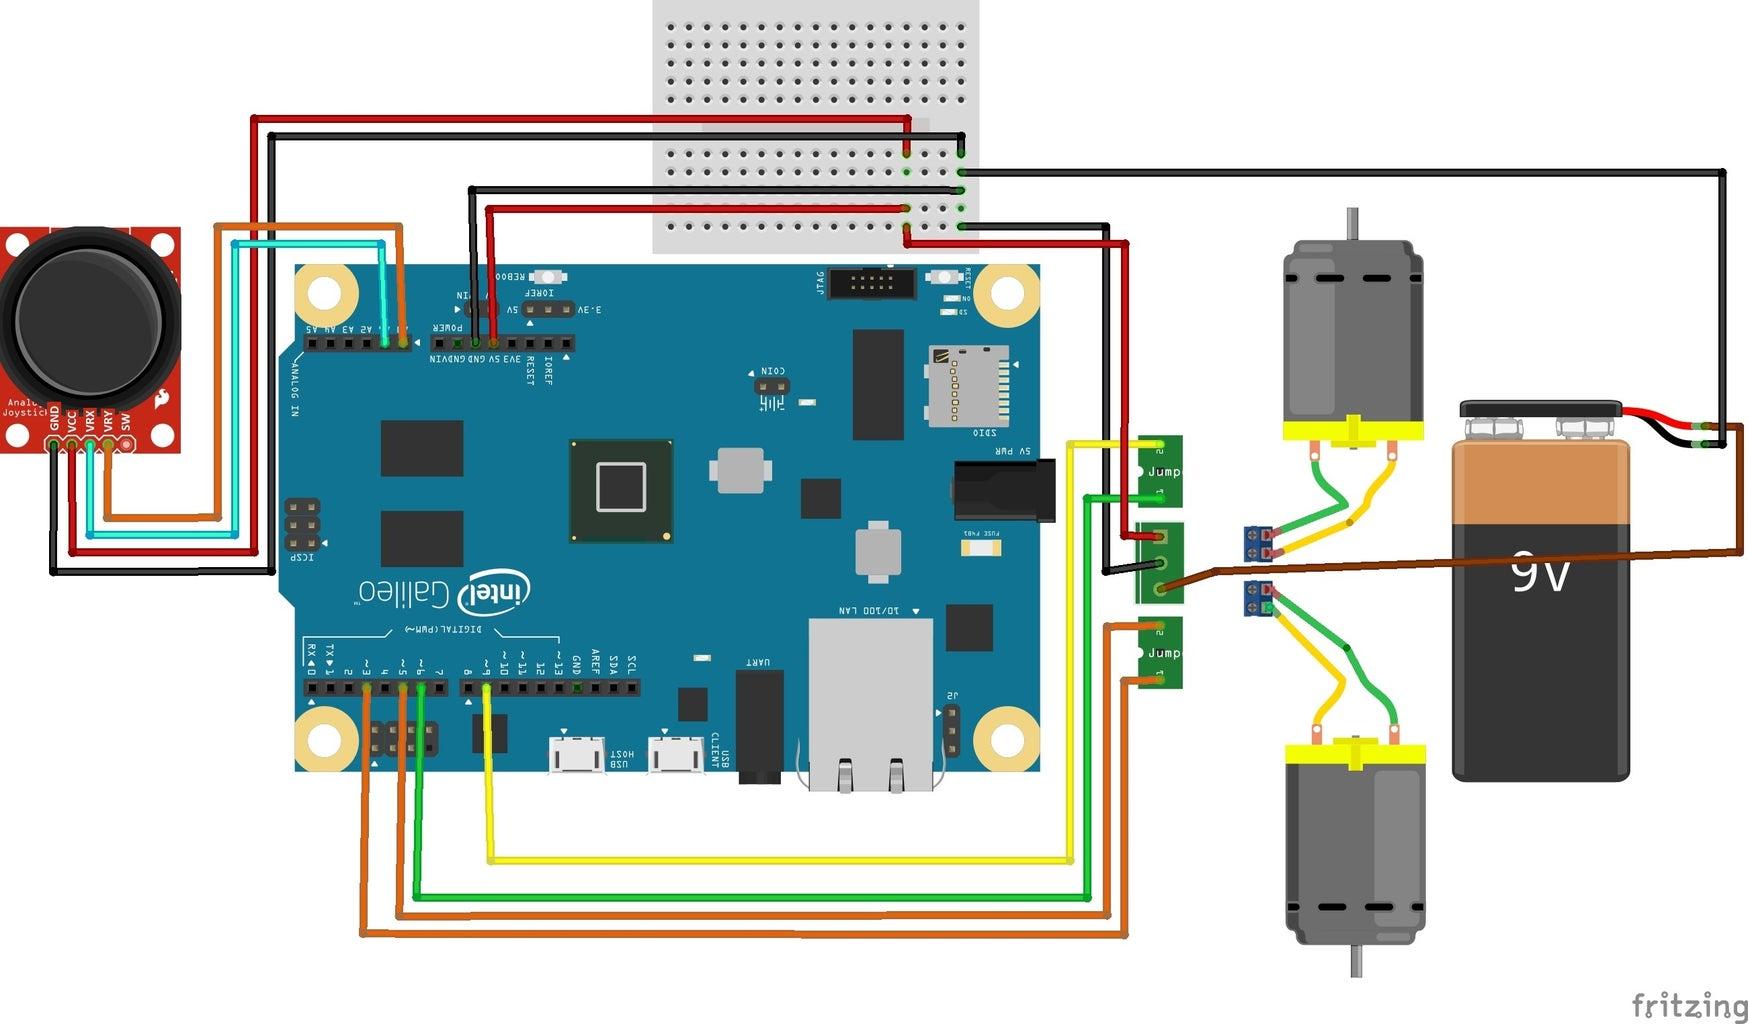 Interfacing Joystick With Intel Galileo